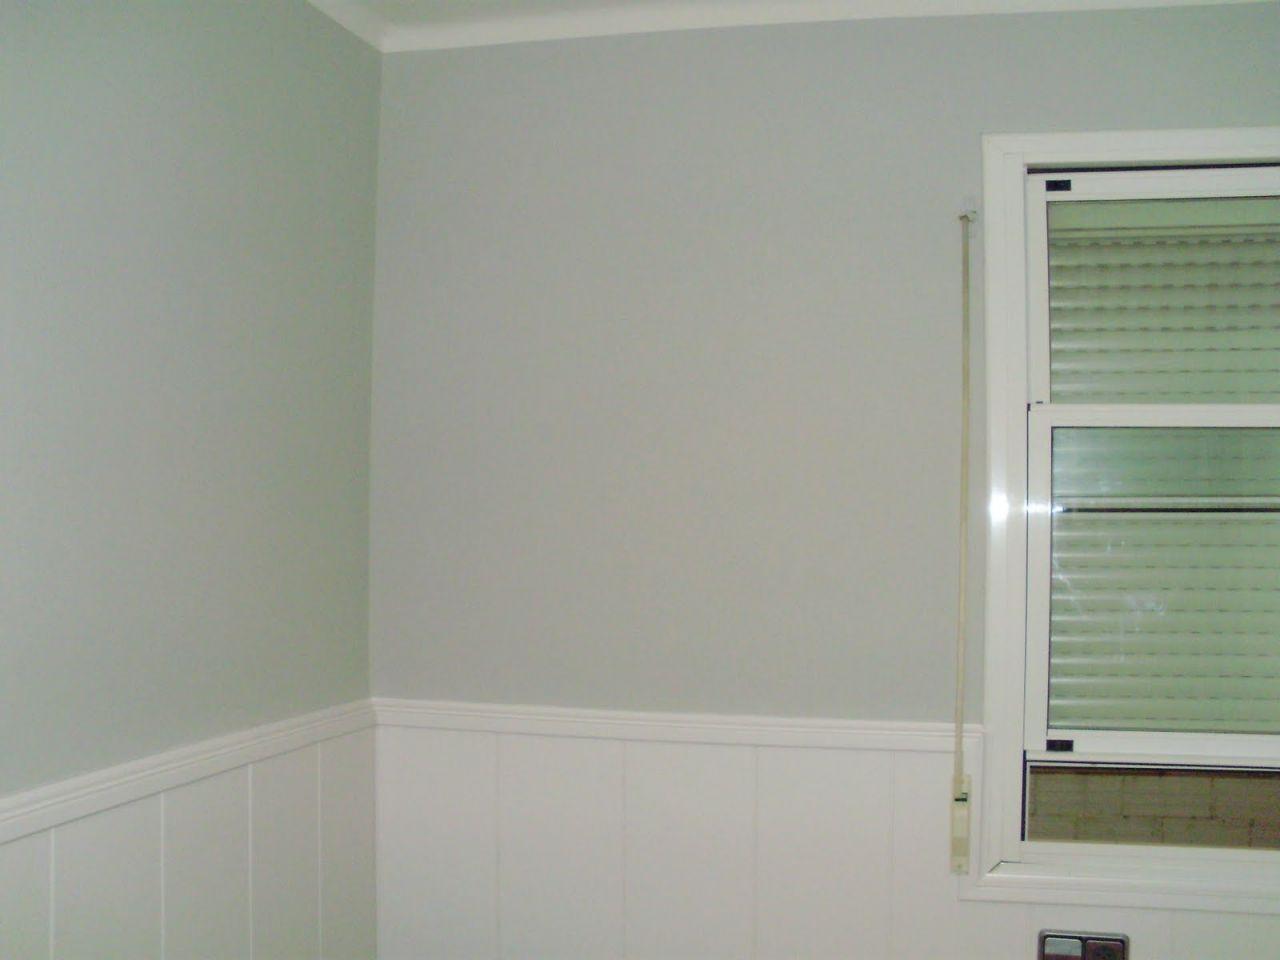 Molduras de madera para pared habitacion ni os buscar - Molduras de madera decorativas ...